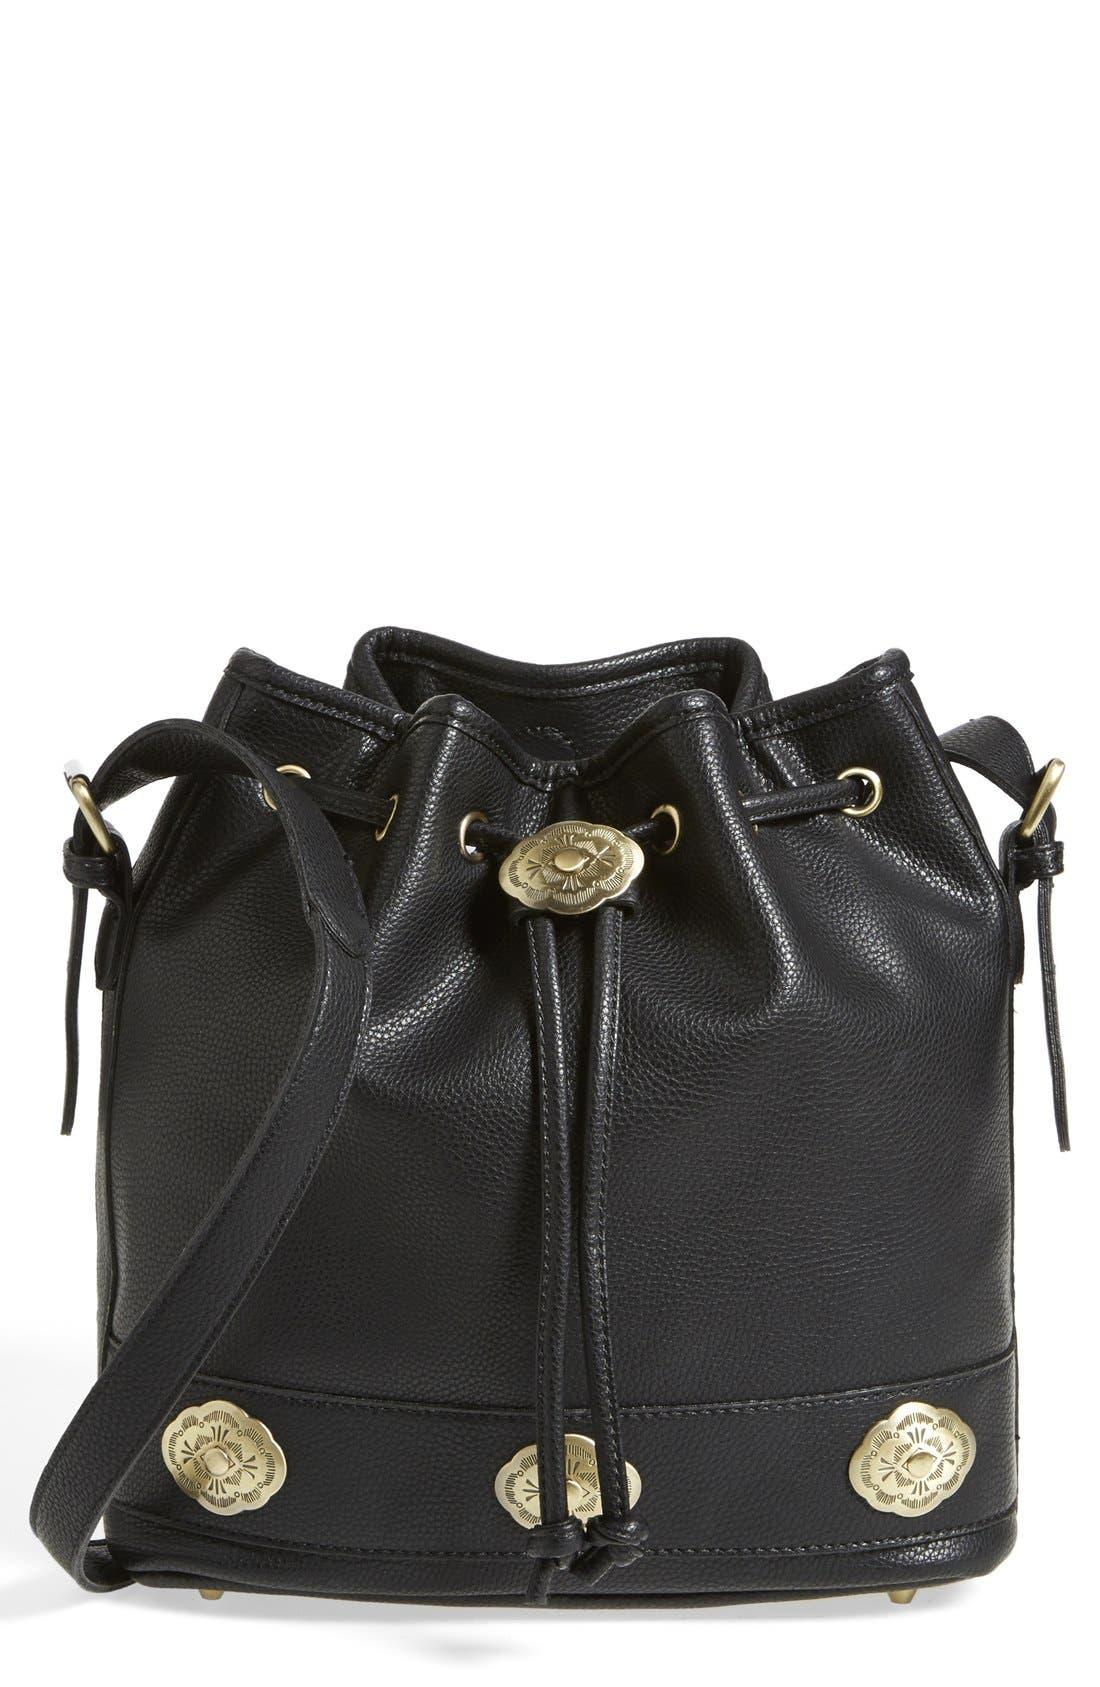 STREET LEVEL, 'Concha' Faux Leather Bucket Bag, Main thumbnail 1, color, 001